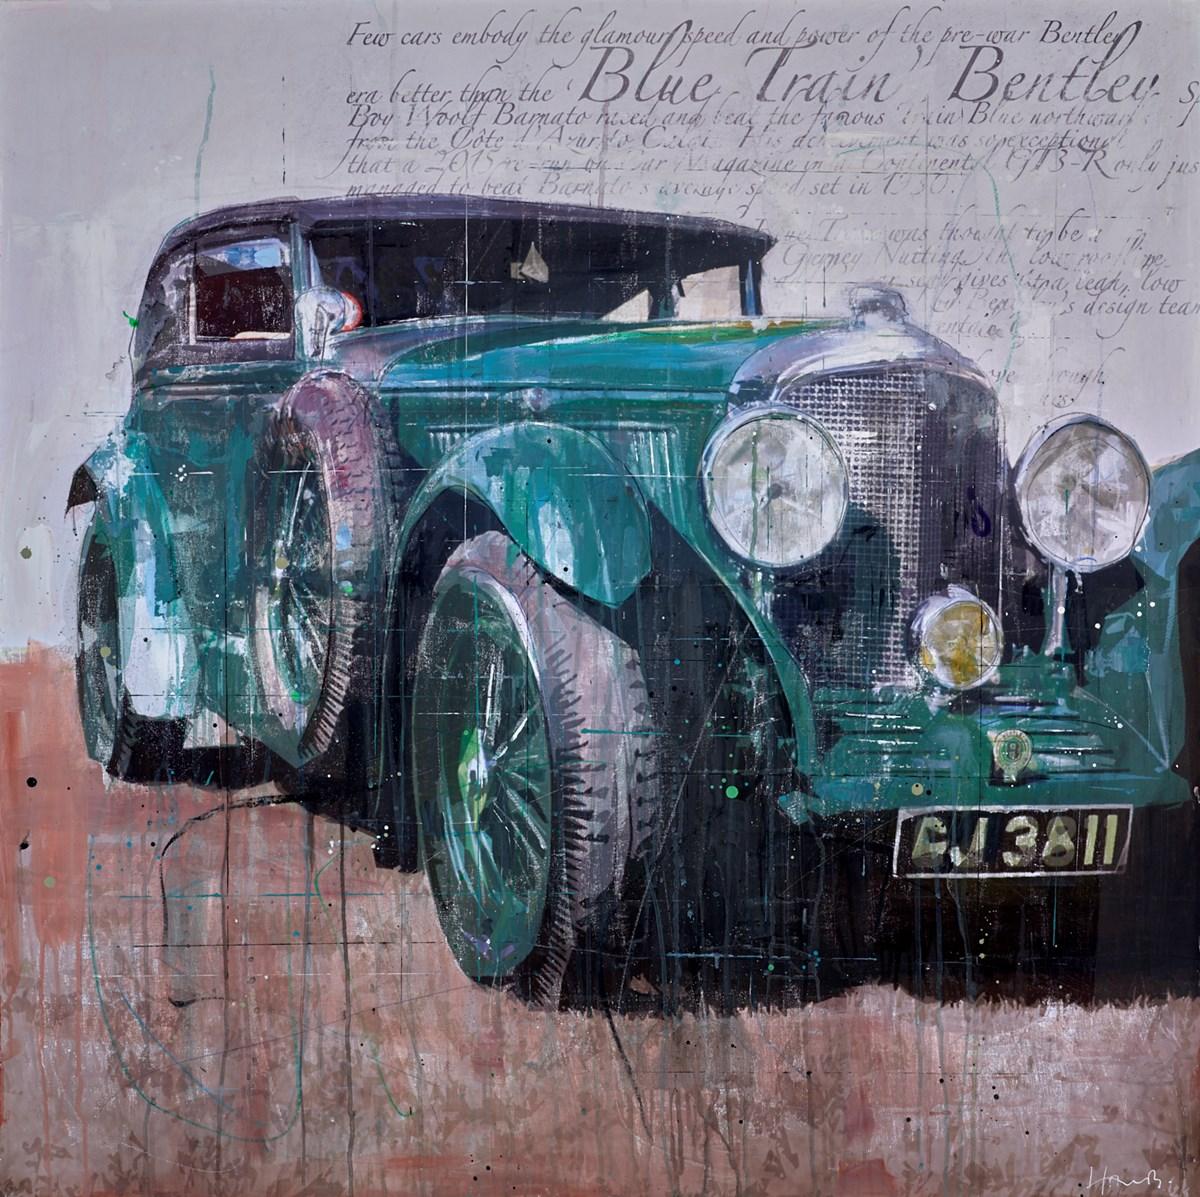 Blue Train Bentley